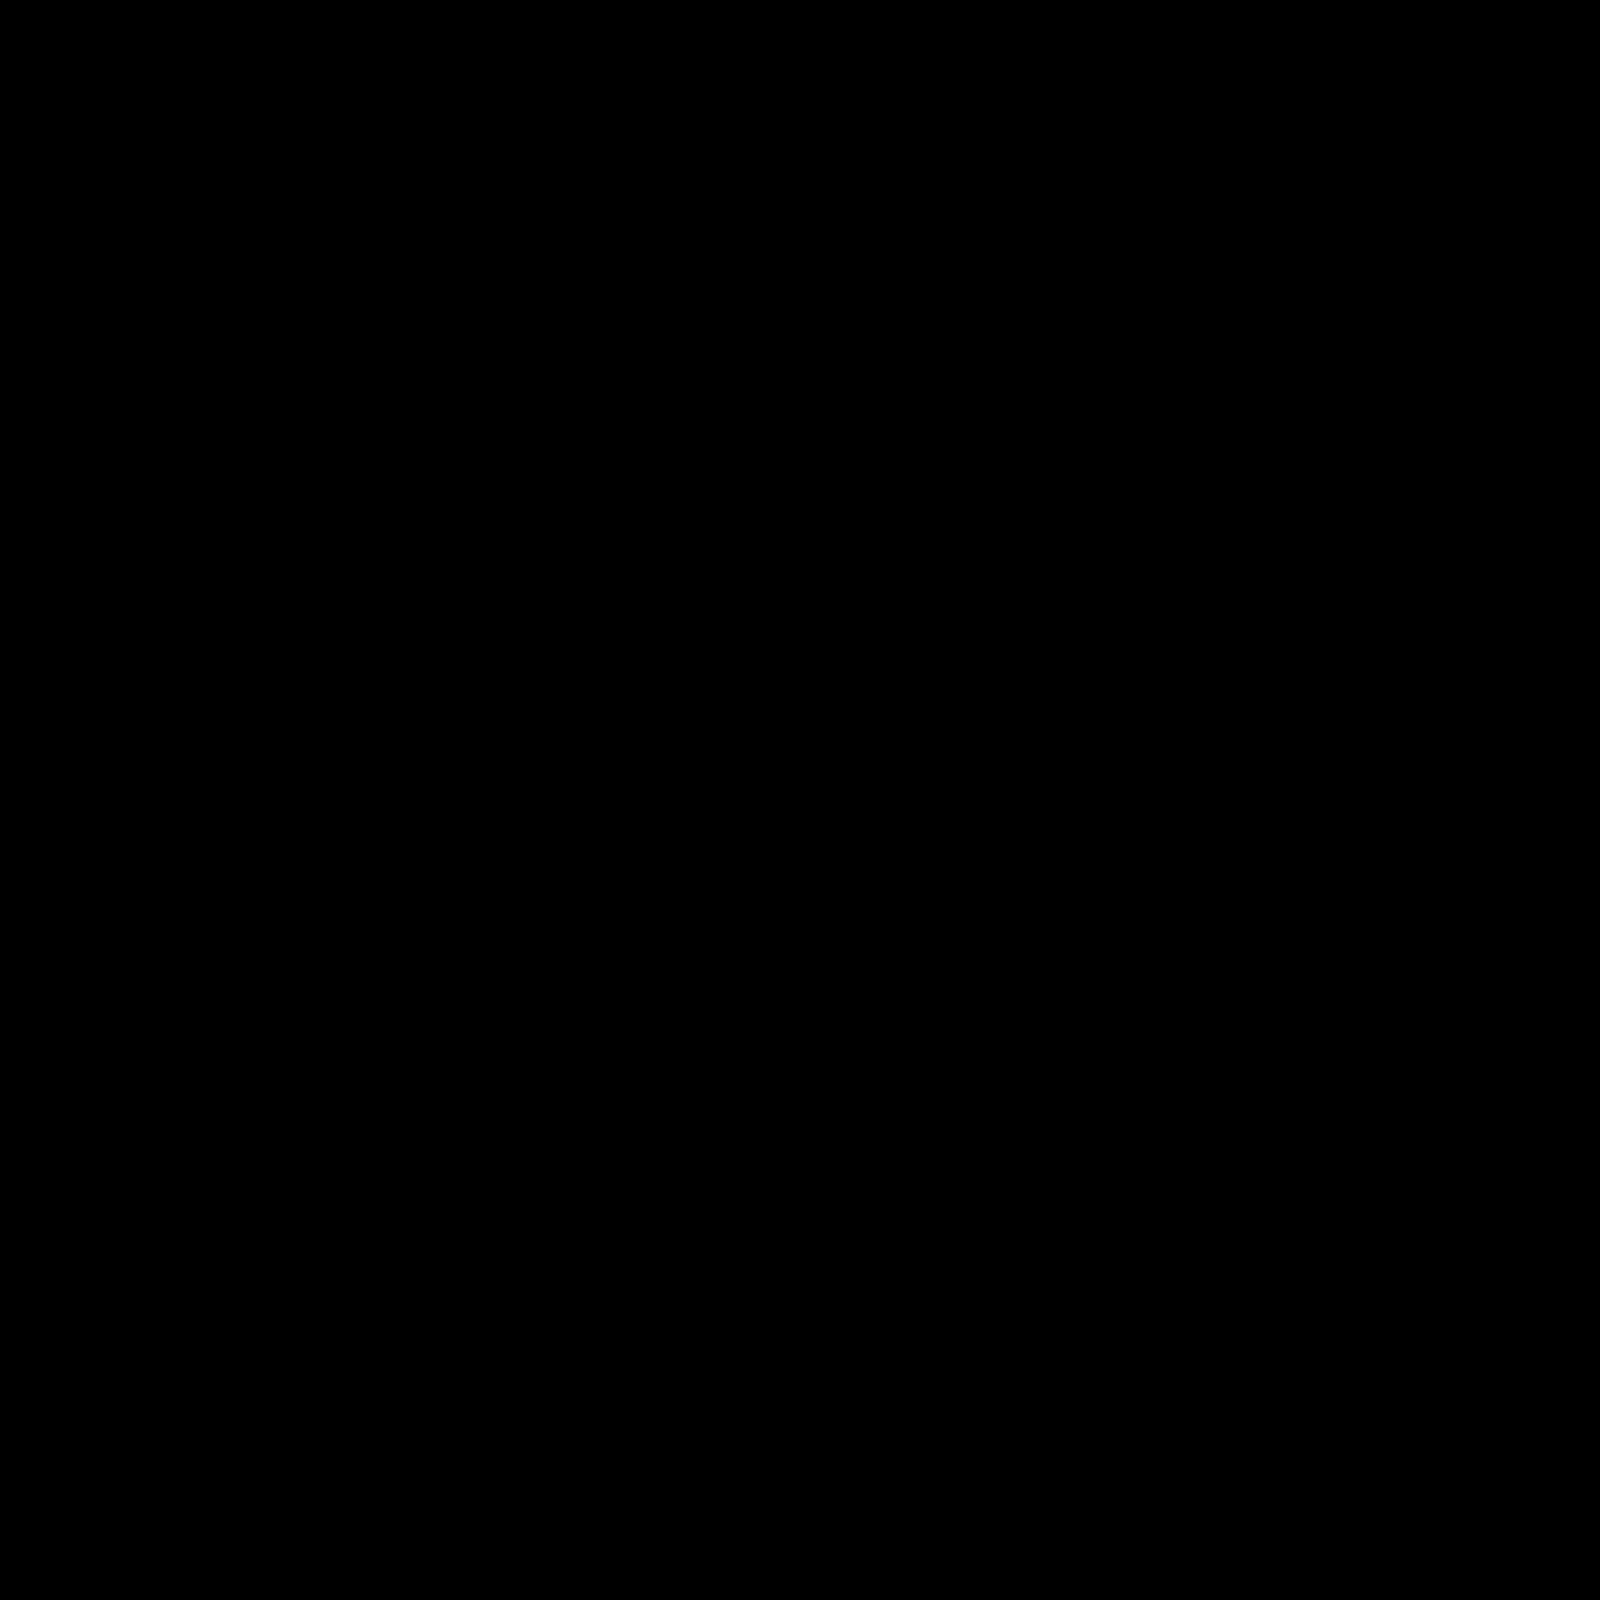 Holandia Mapa icon